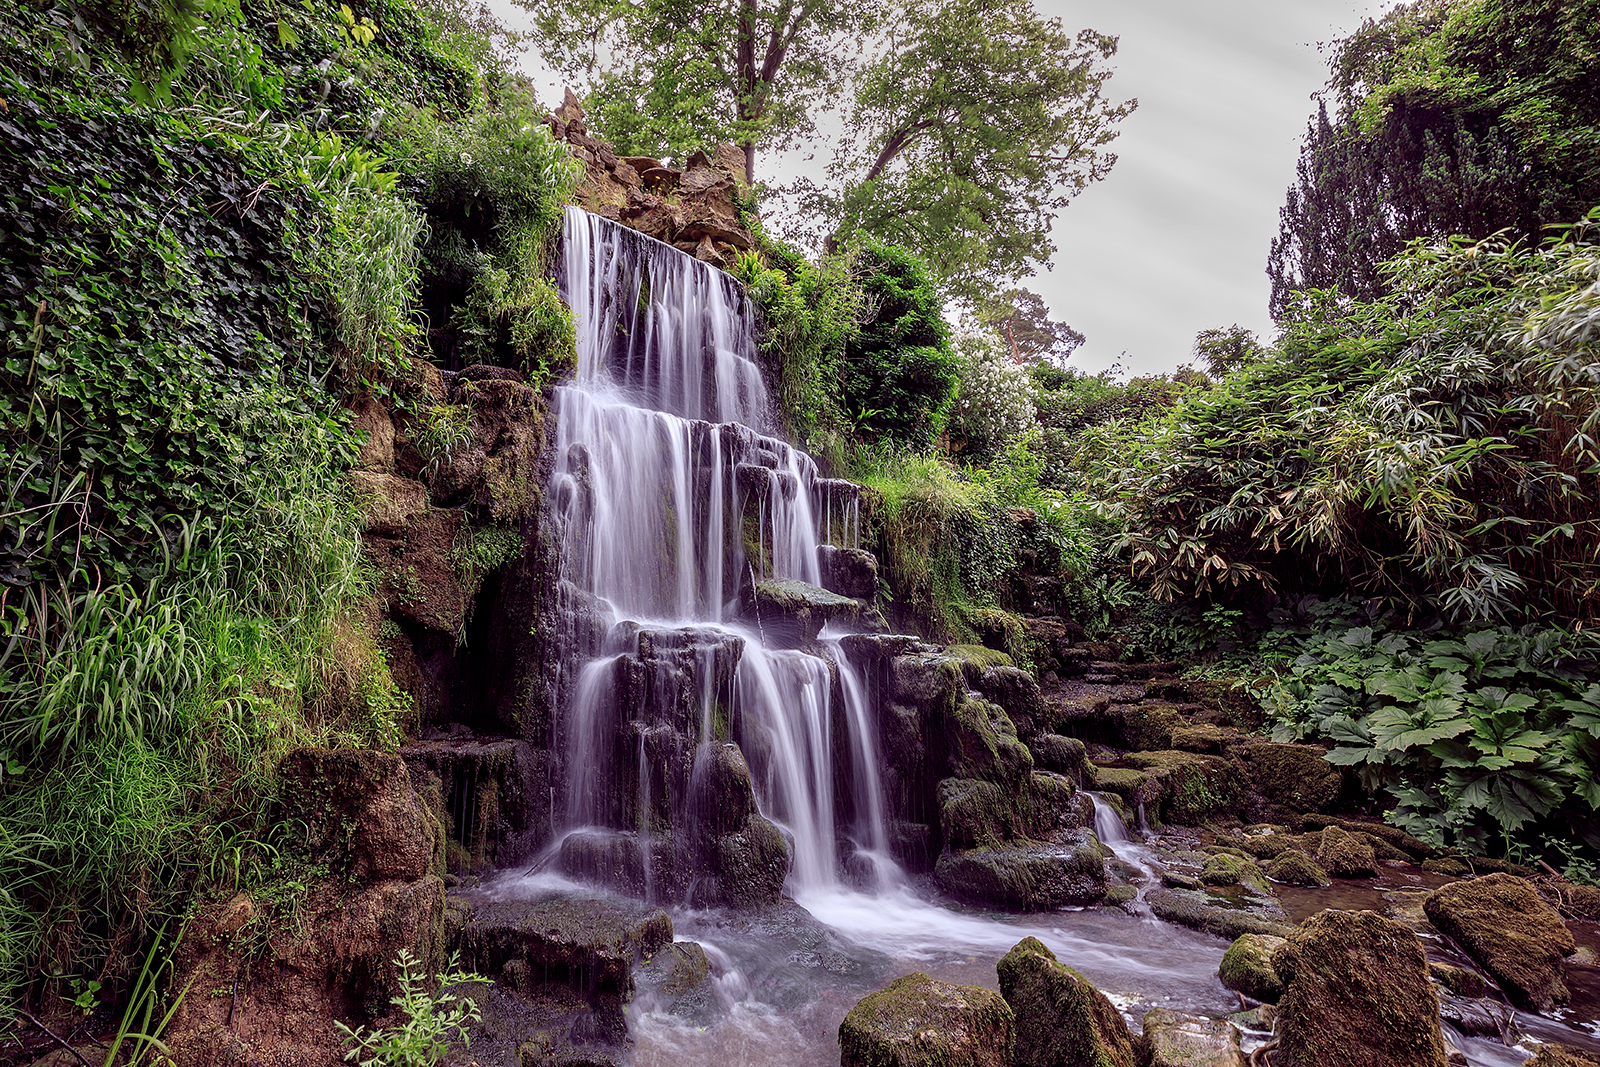 'Bowood Waterfall' by Shaun Duke